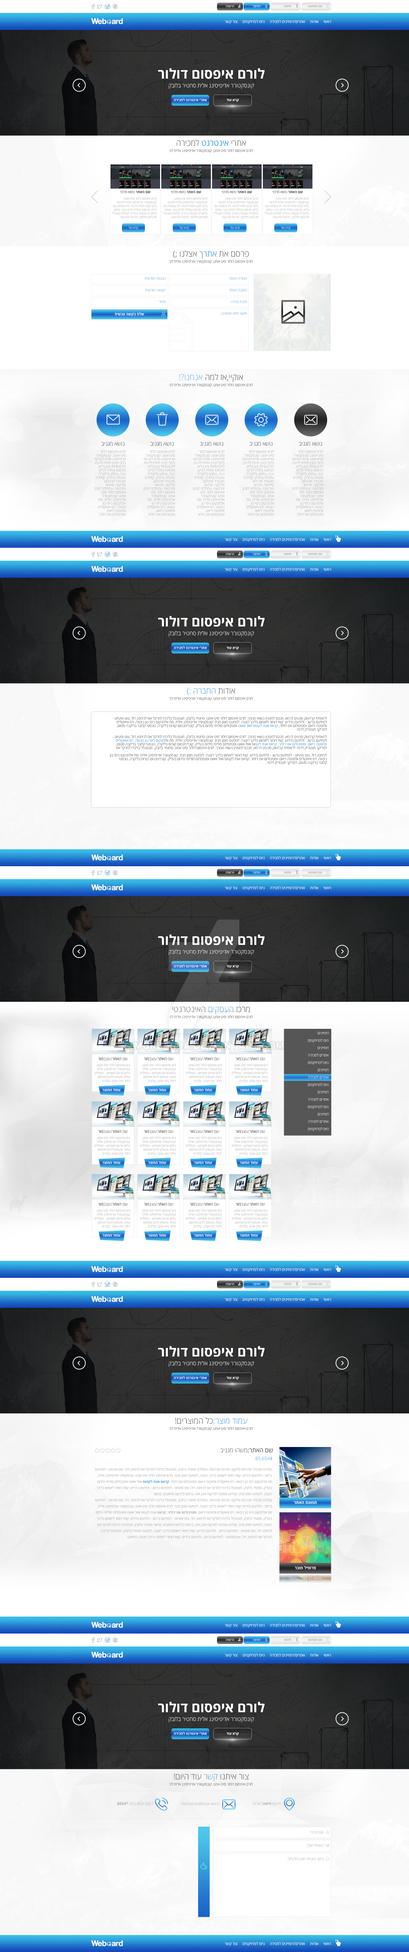 Website design - Weboard - SOLD by MorBarda